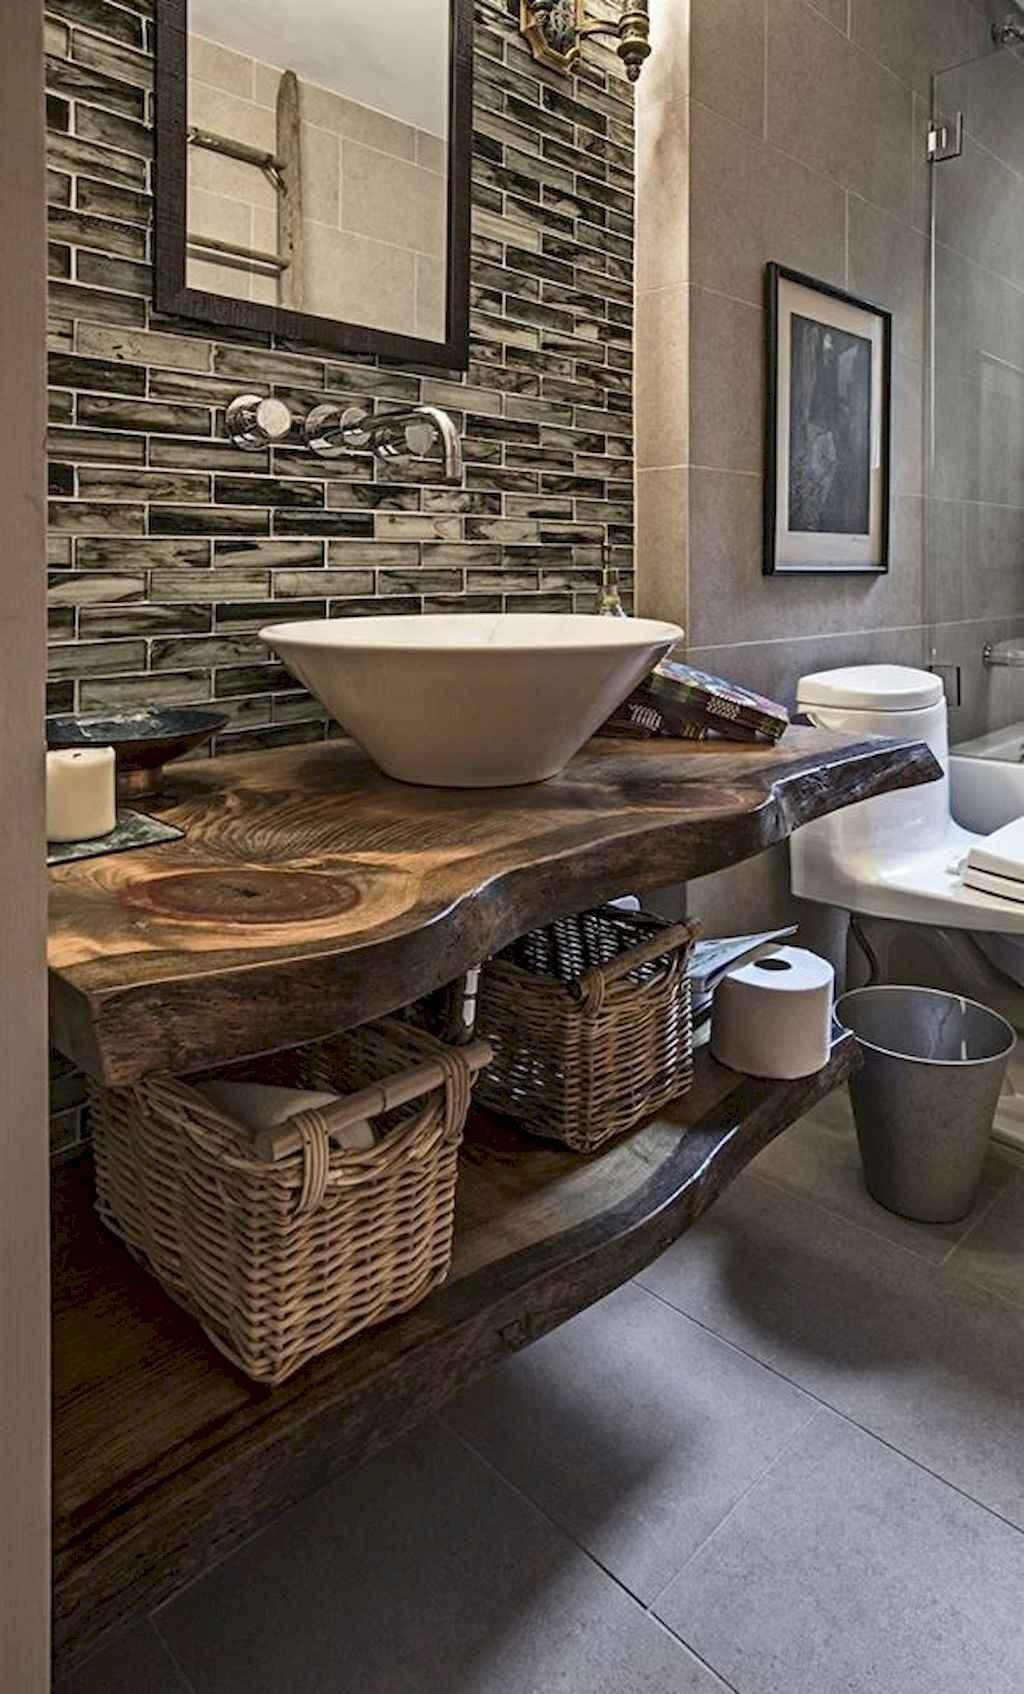 125 awesome farmhouse bathroom vanity remodel ideas (32)